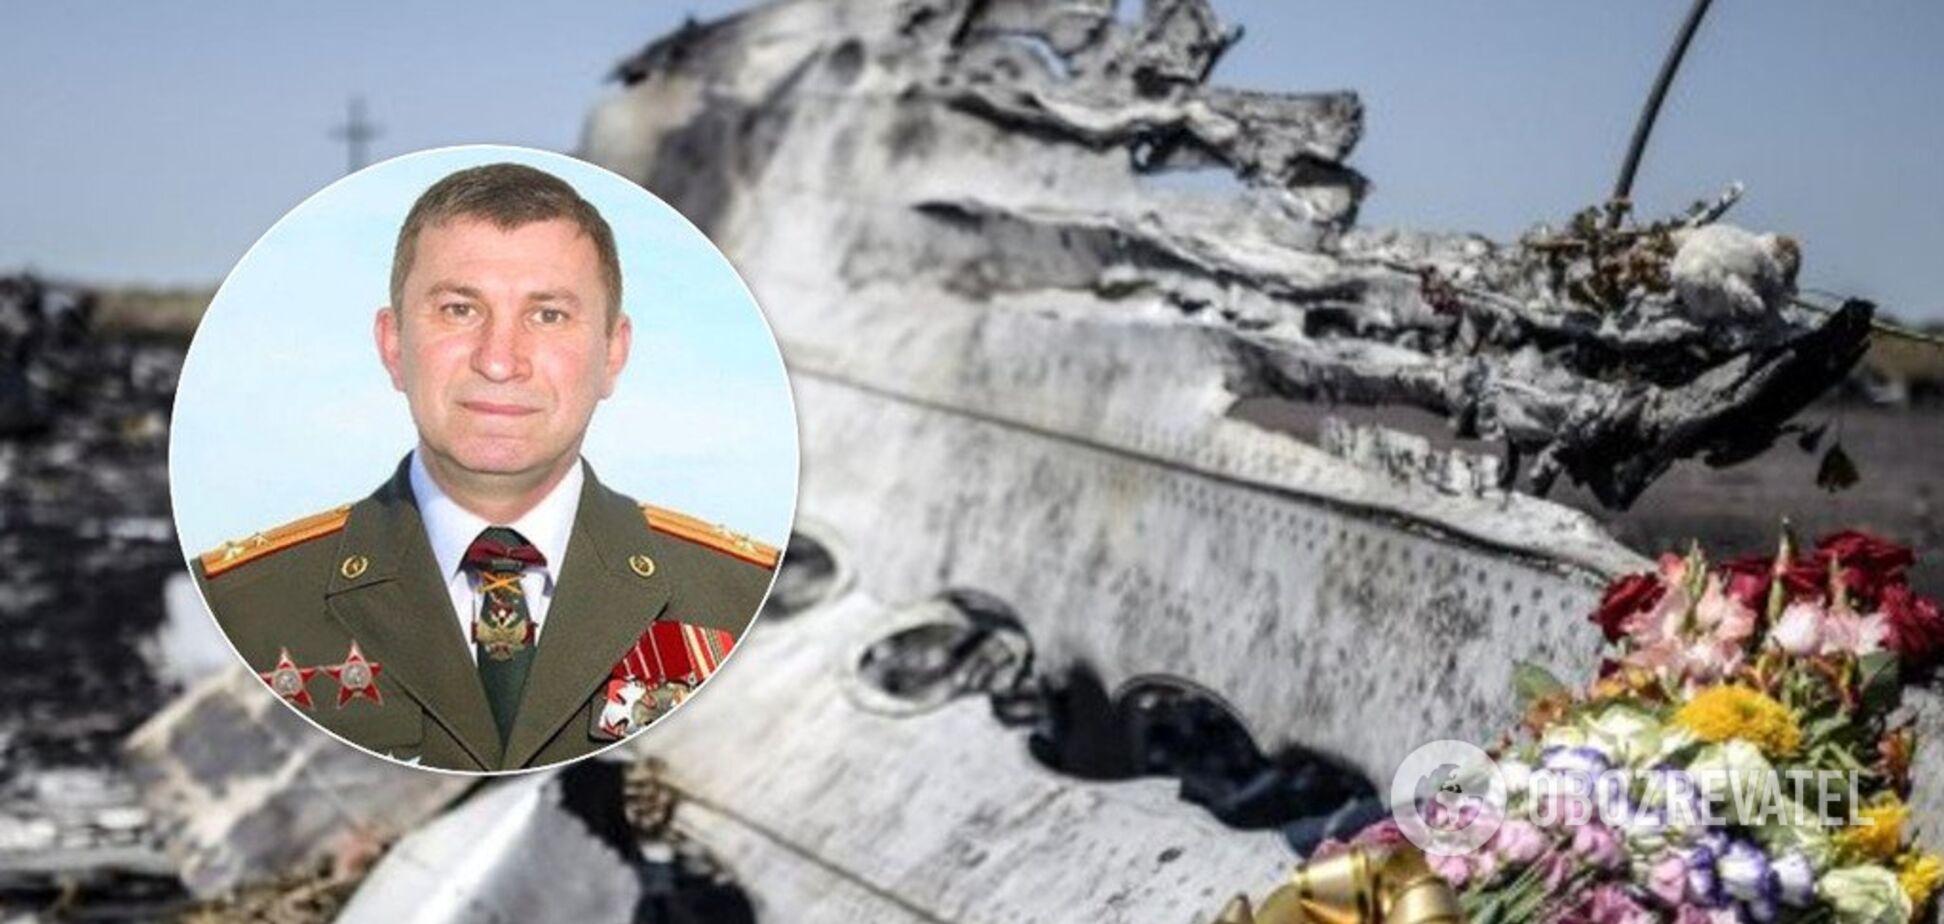 Сергей 'Хмурый' Дубинский